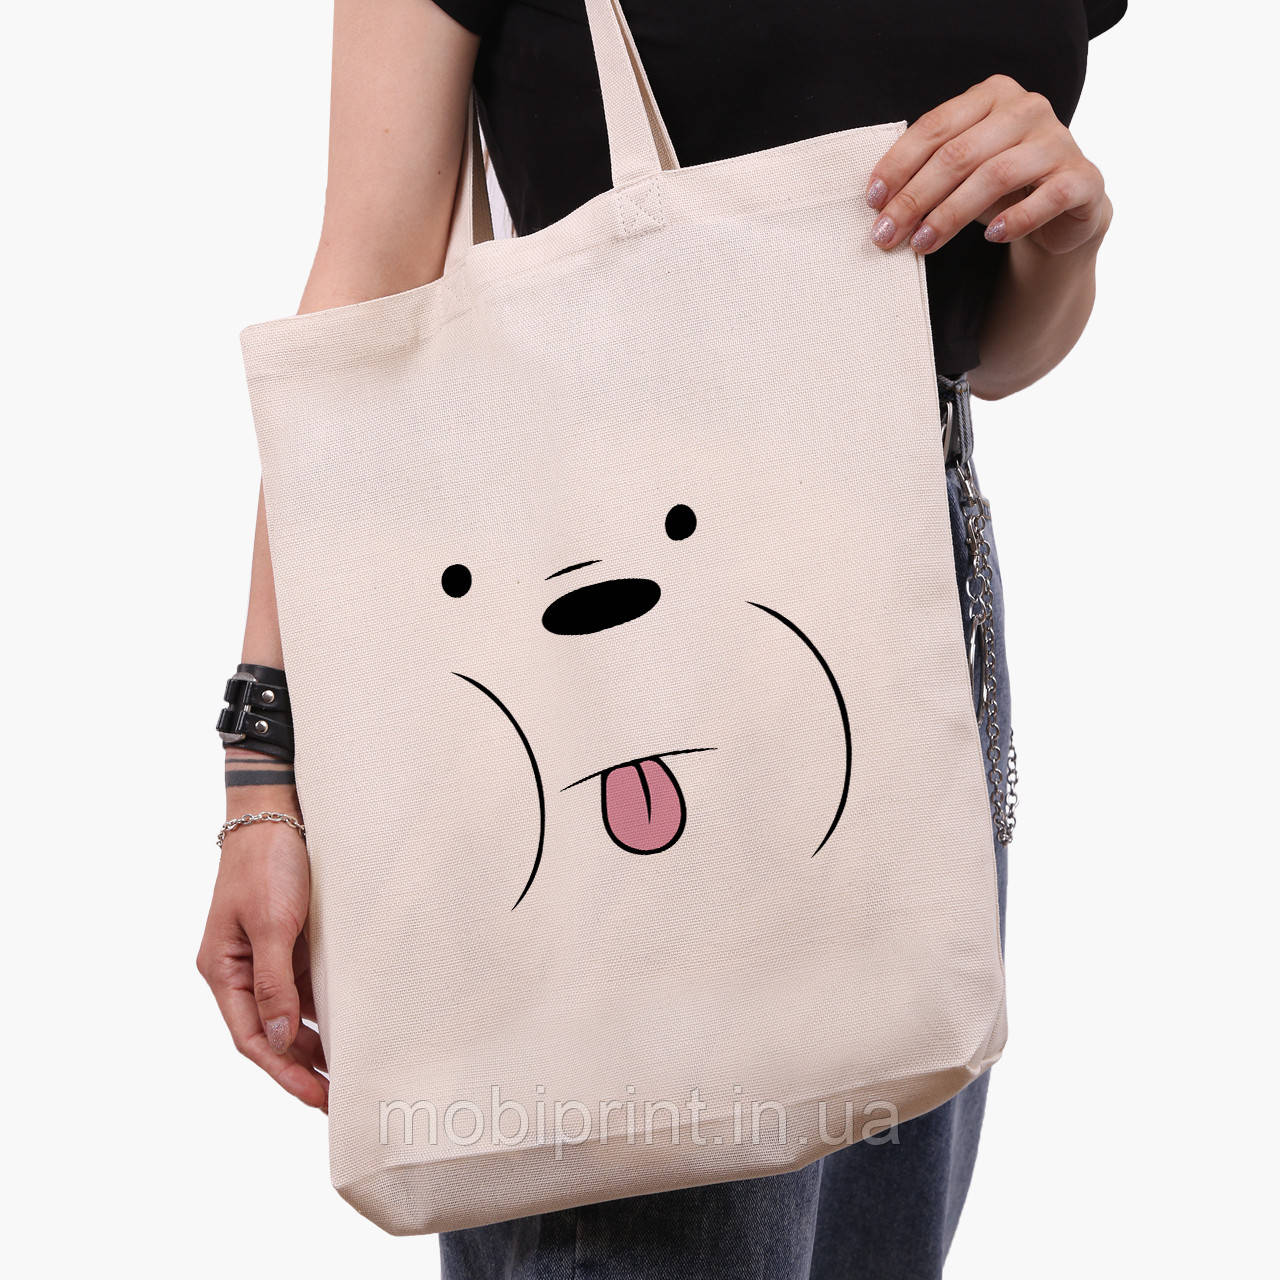 Эко сумка шоппер белая Белый медведь Вся правда о медведях (We Bare Bears) (9227-2662-1)  41*39*8 см